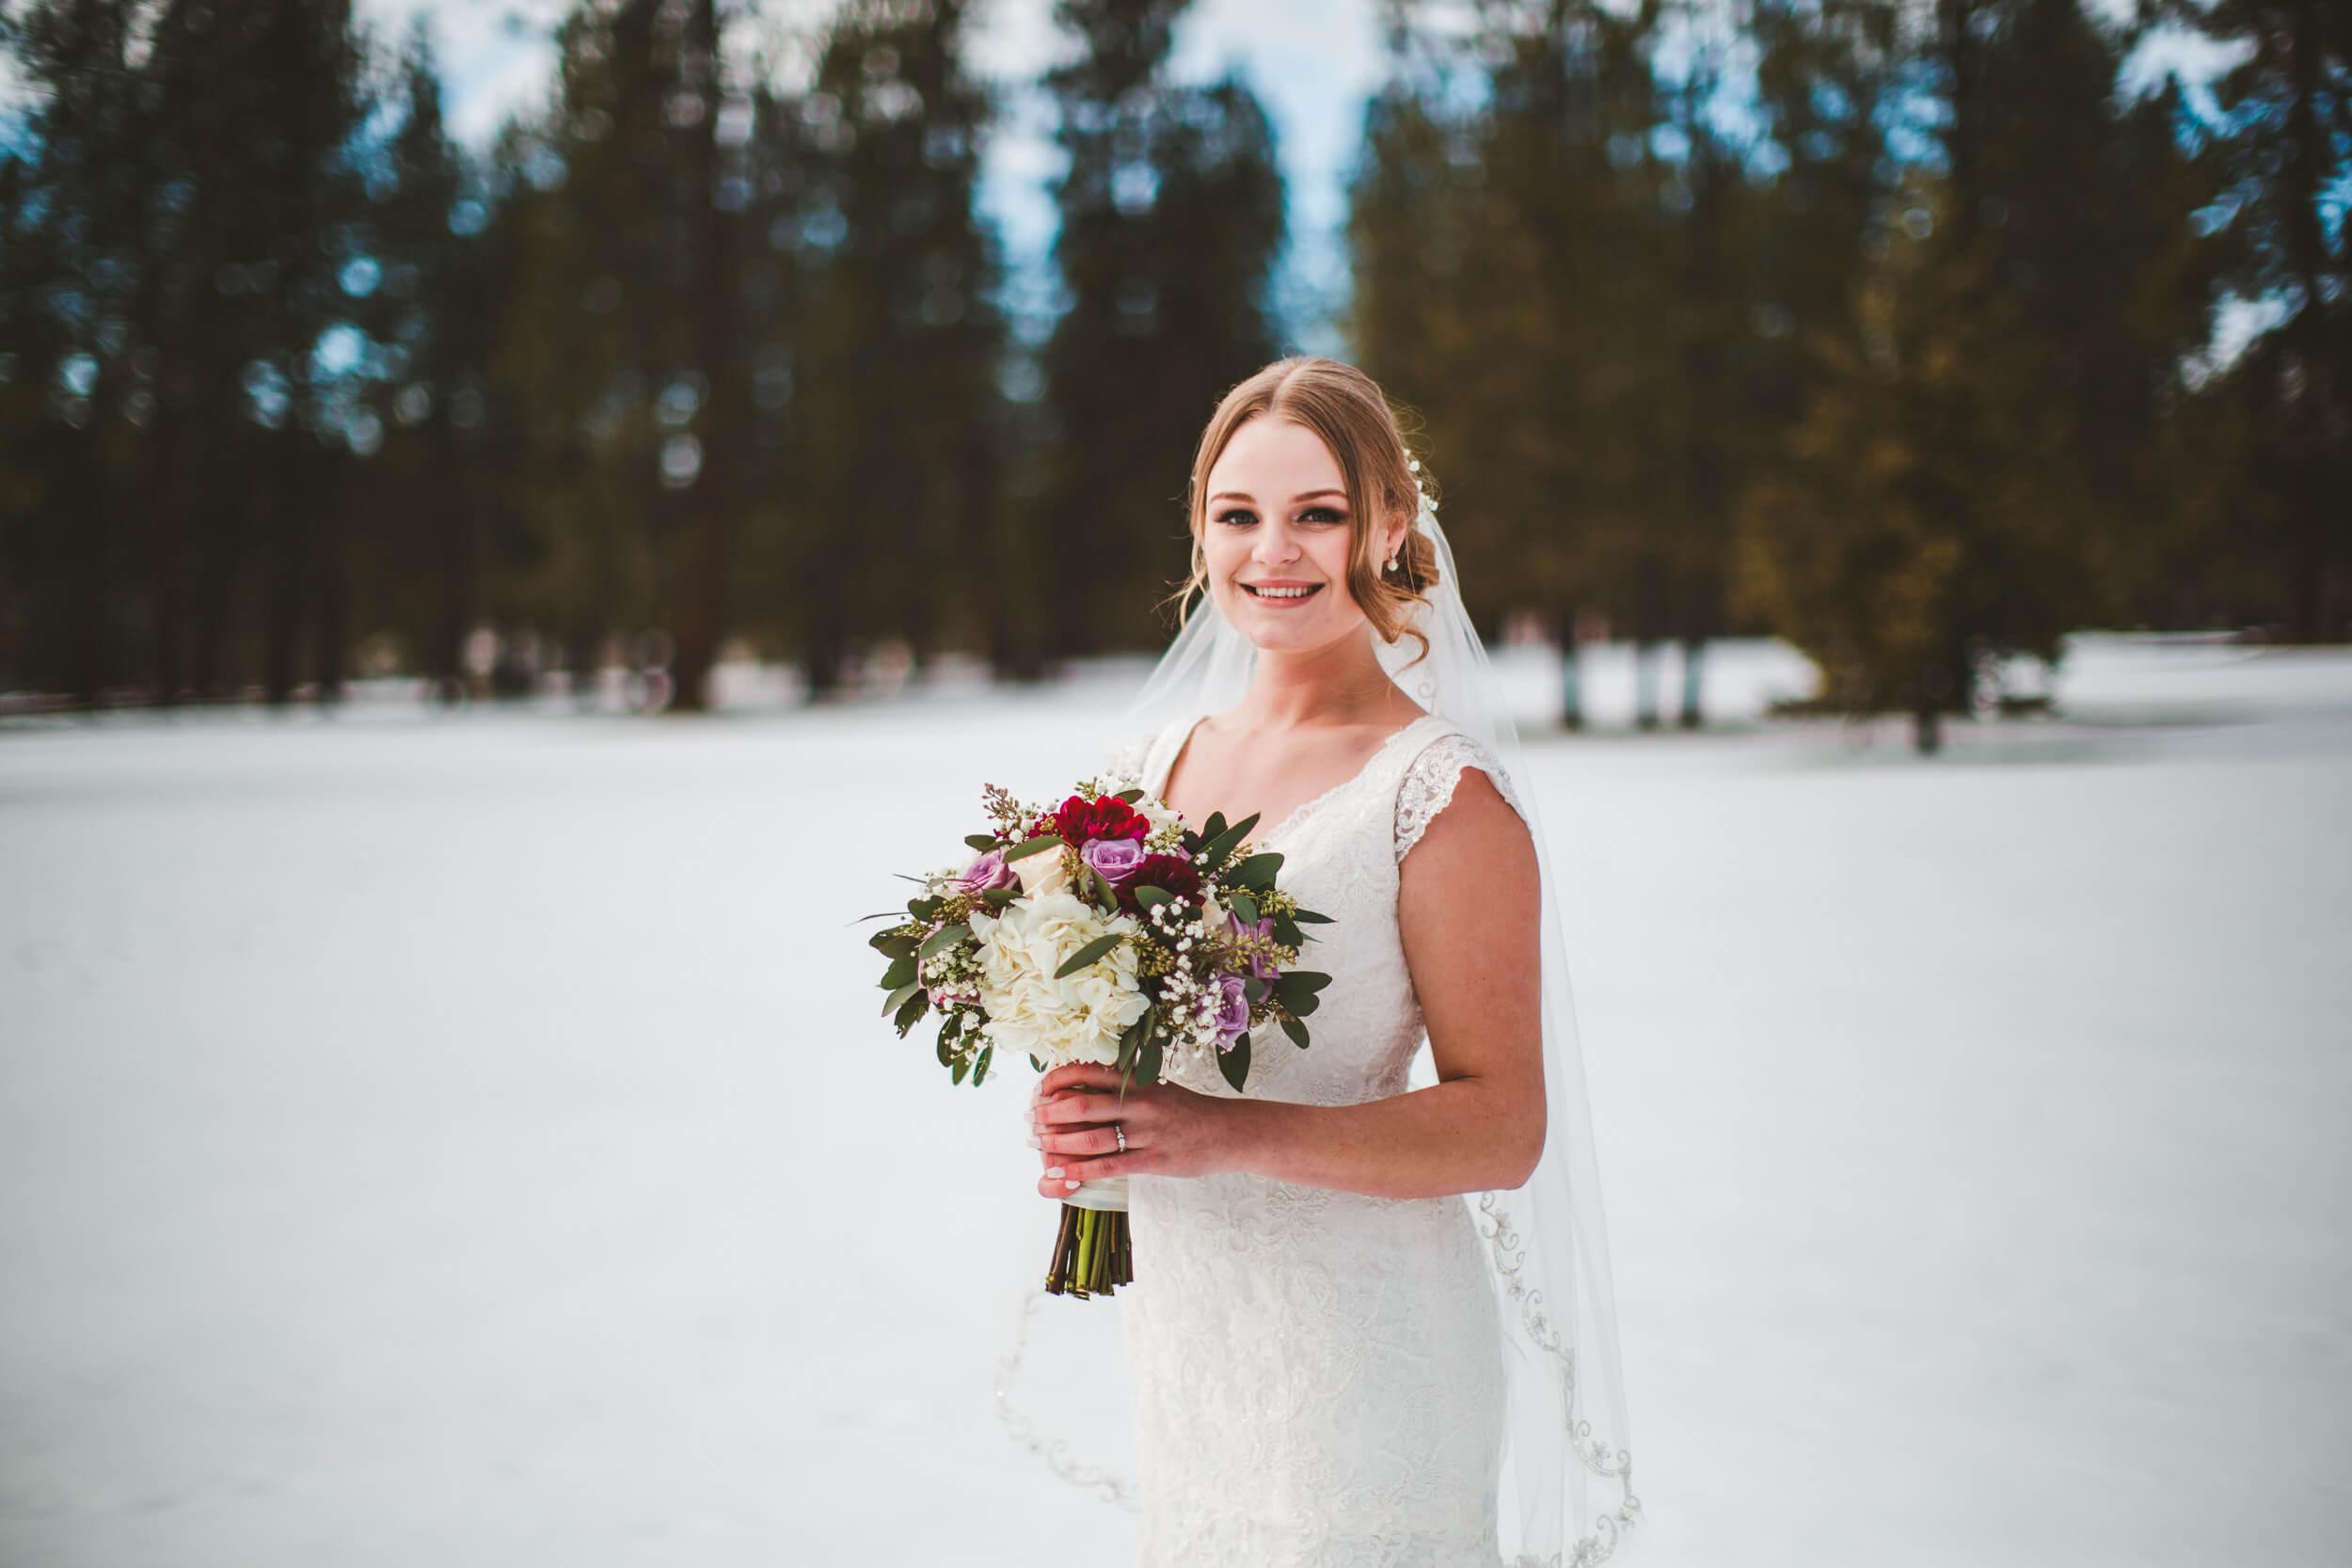 mukogawa winter wedding in spokane (112).jpg